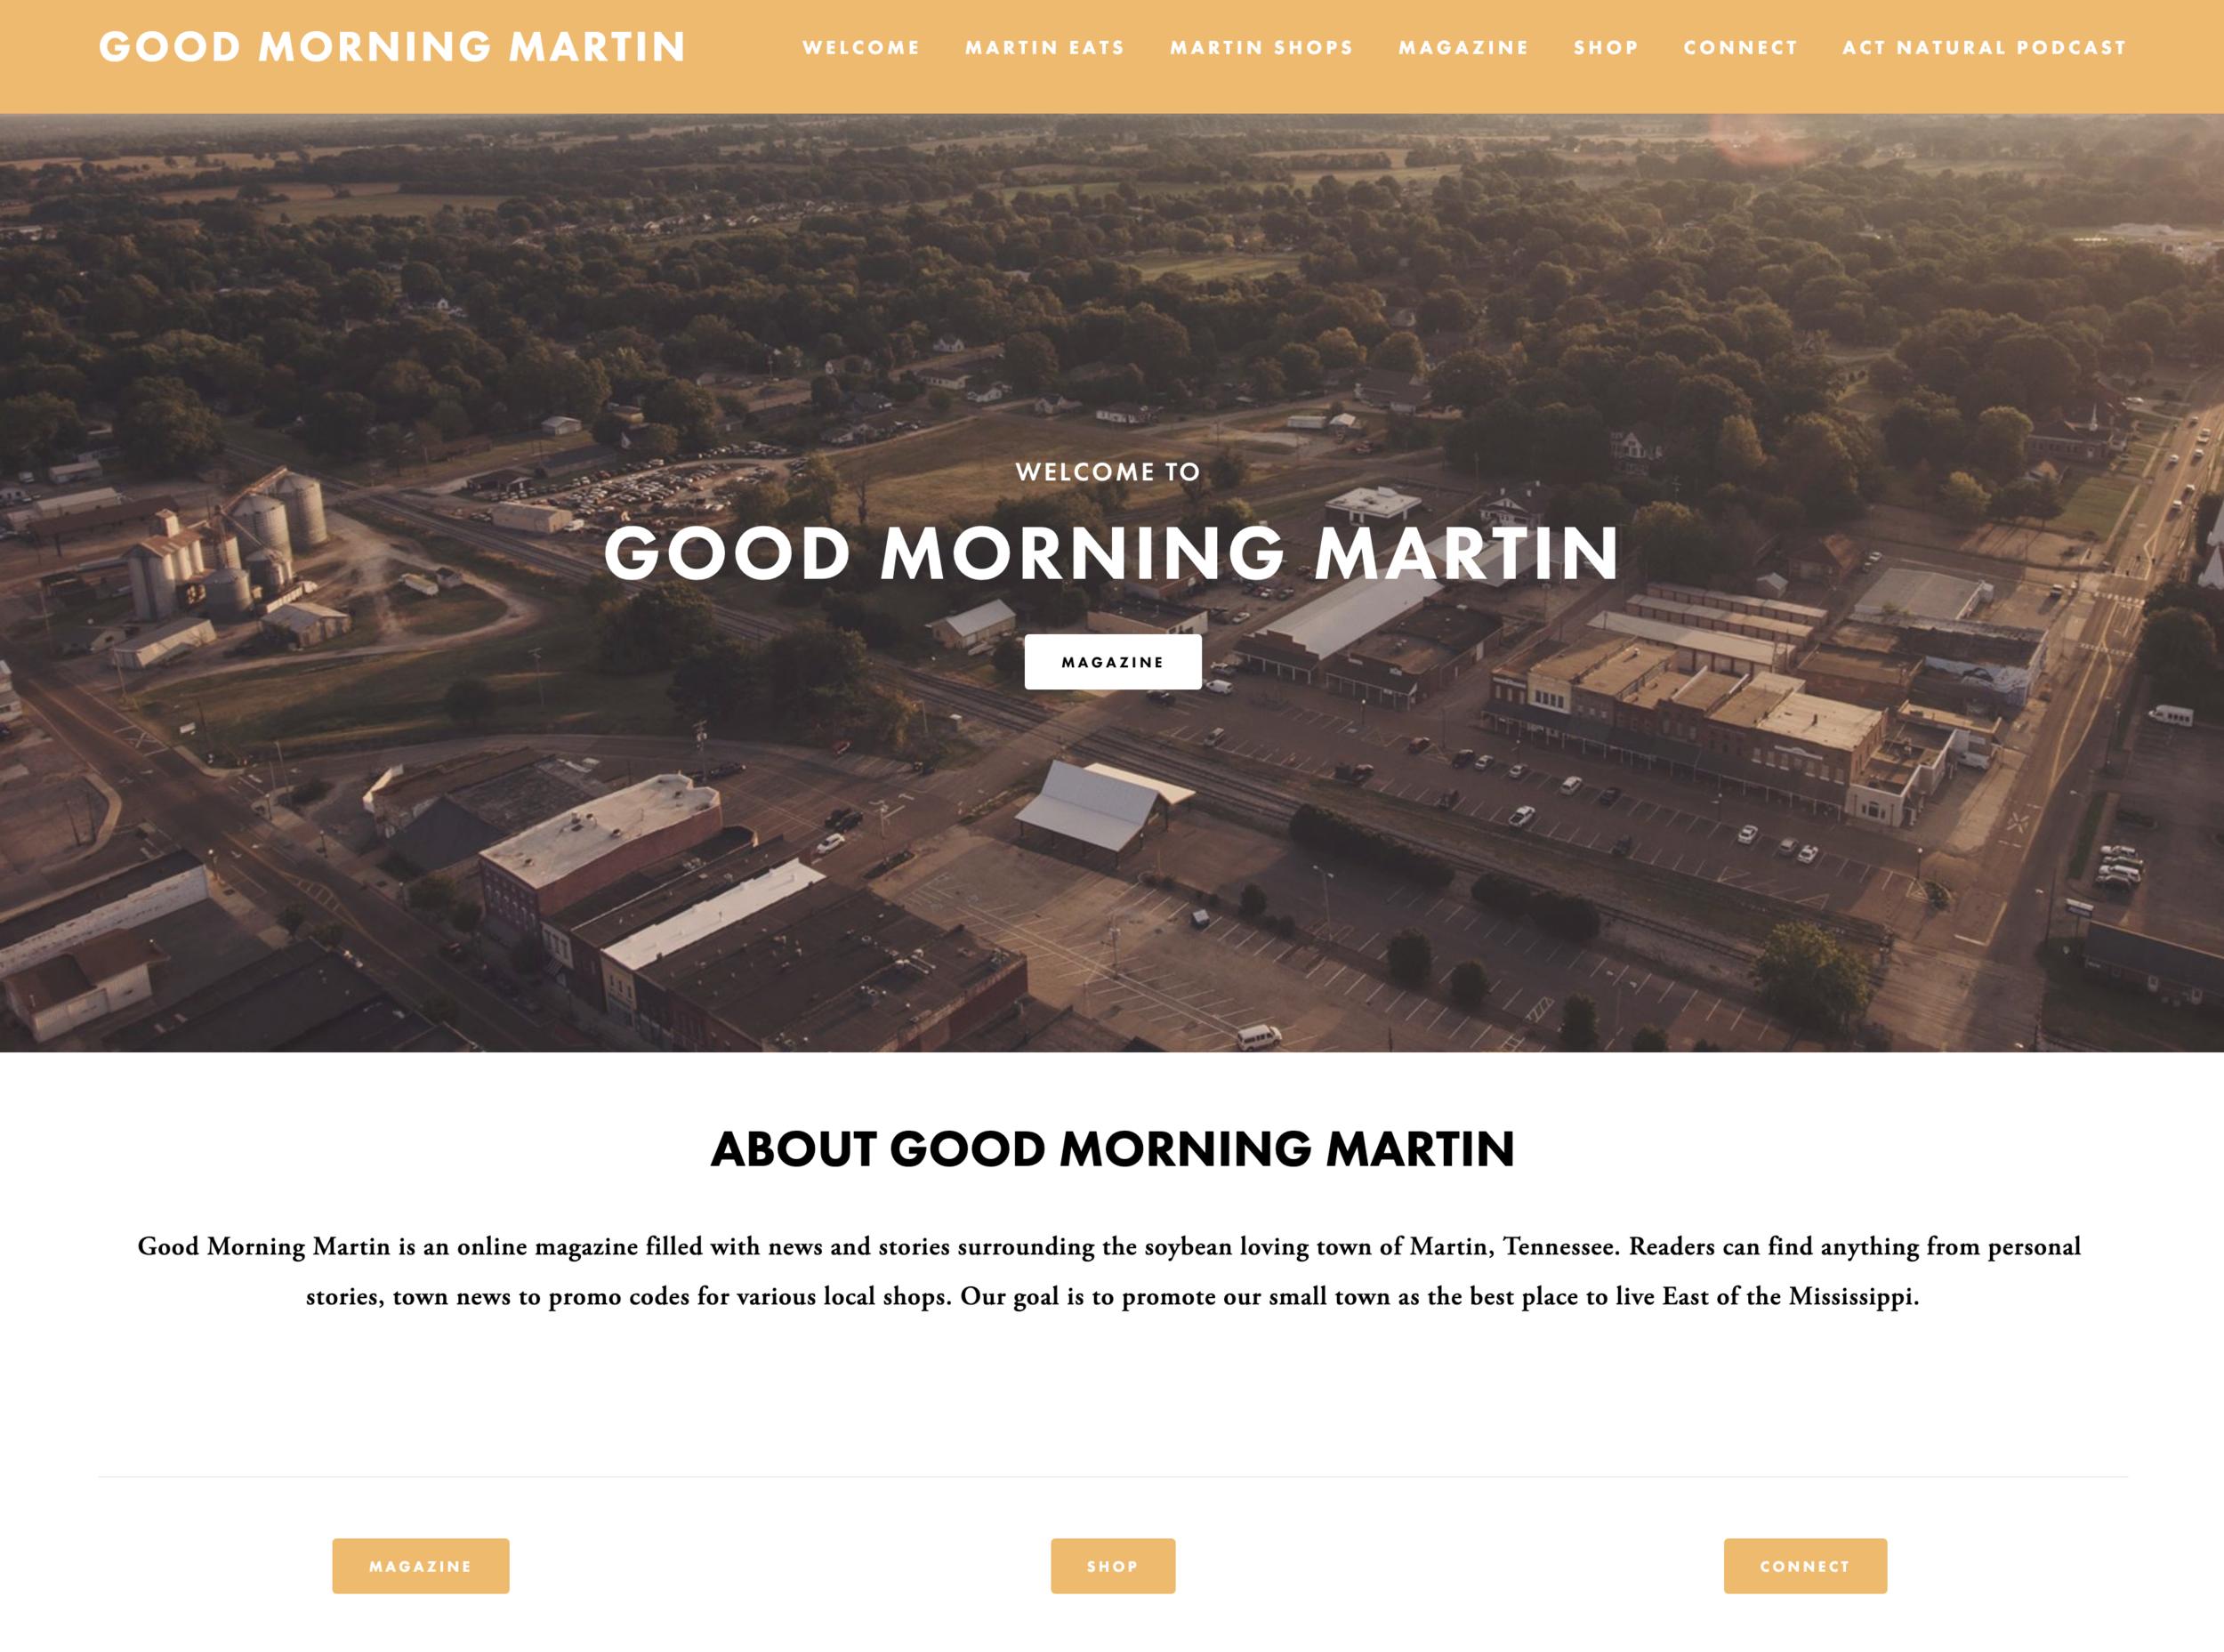 www.GoodMorningMartin.com